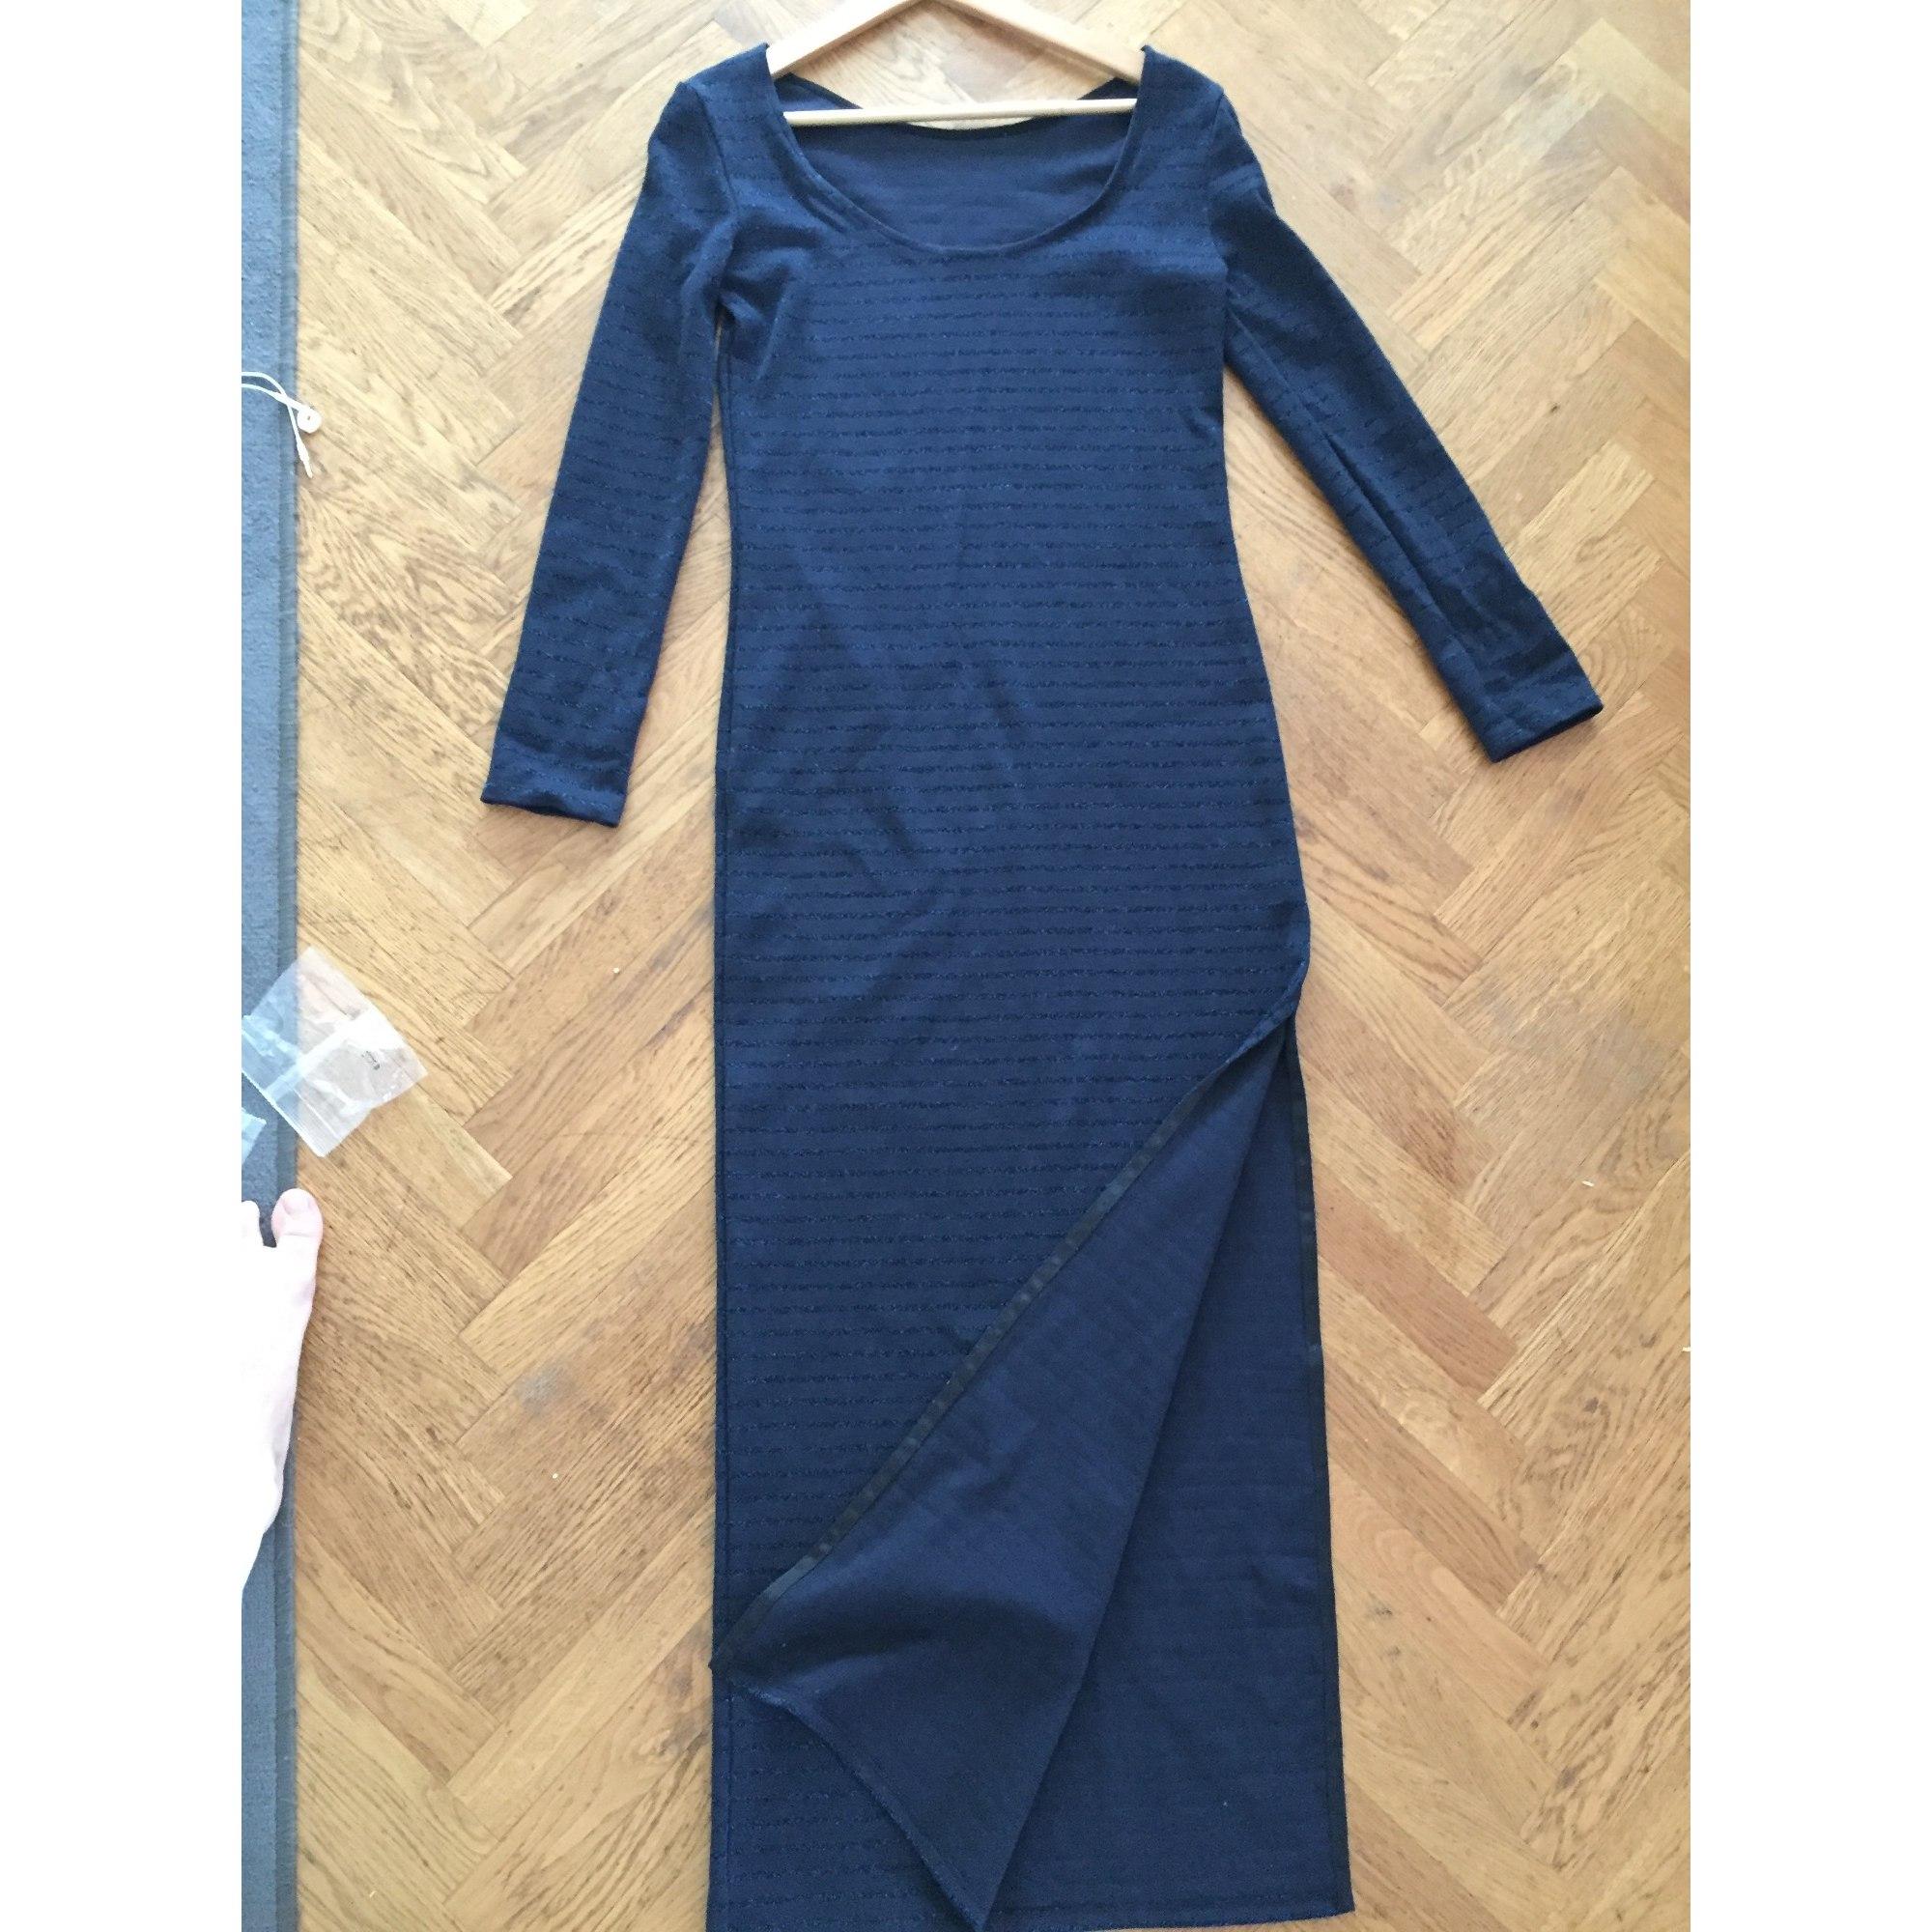 Robe Longue Petit Bateau 36 S T1 Bleu 7895565